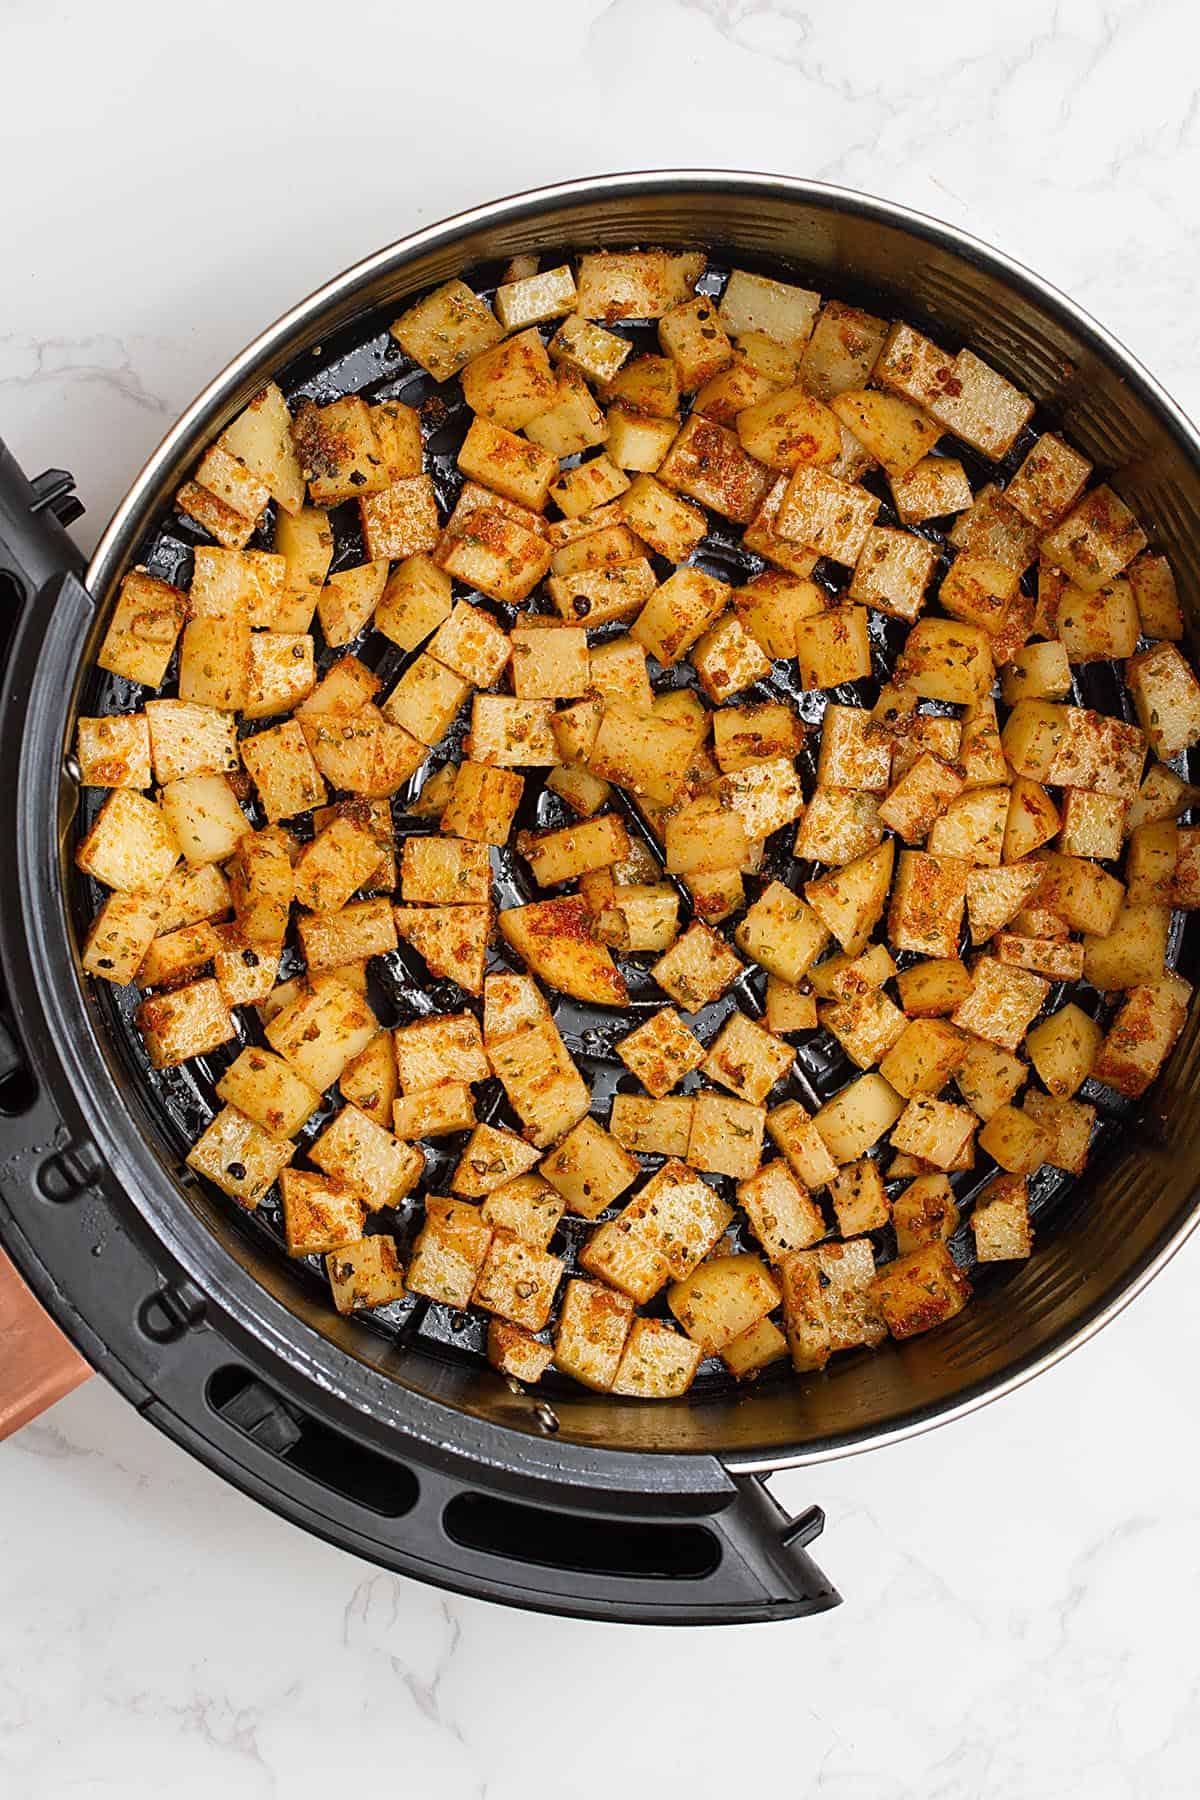 diced potatoes in air fryer